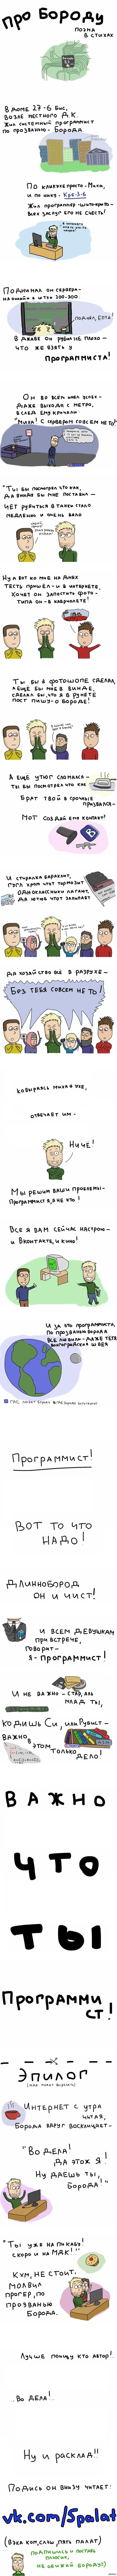 http://s.pikabu.ru/post_img/2013/09/13/7/1379063566_2114604436.jpg